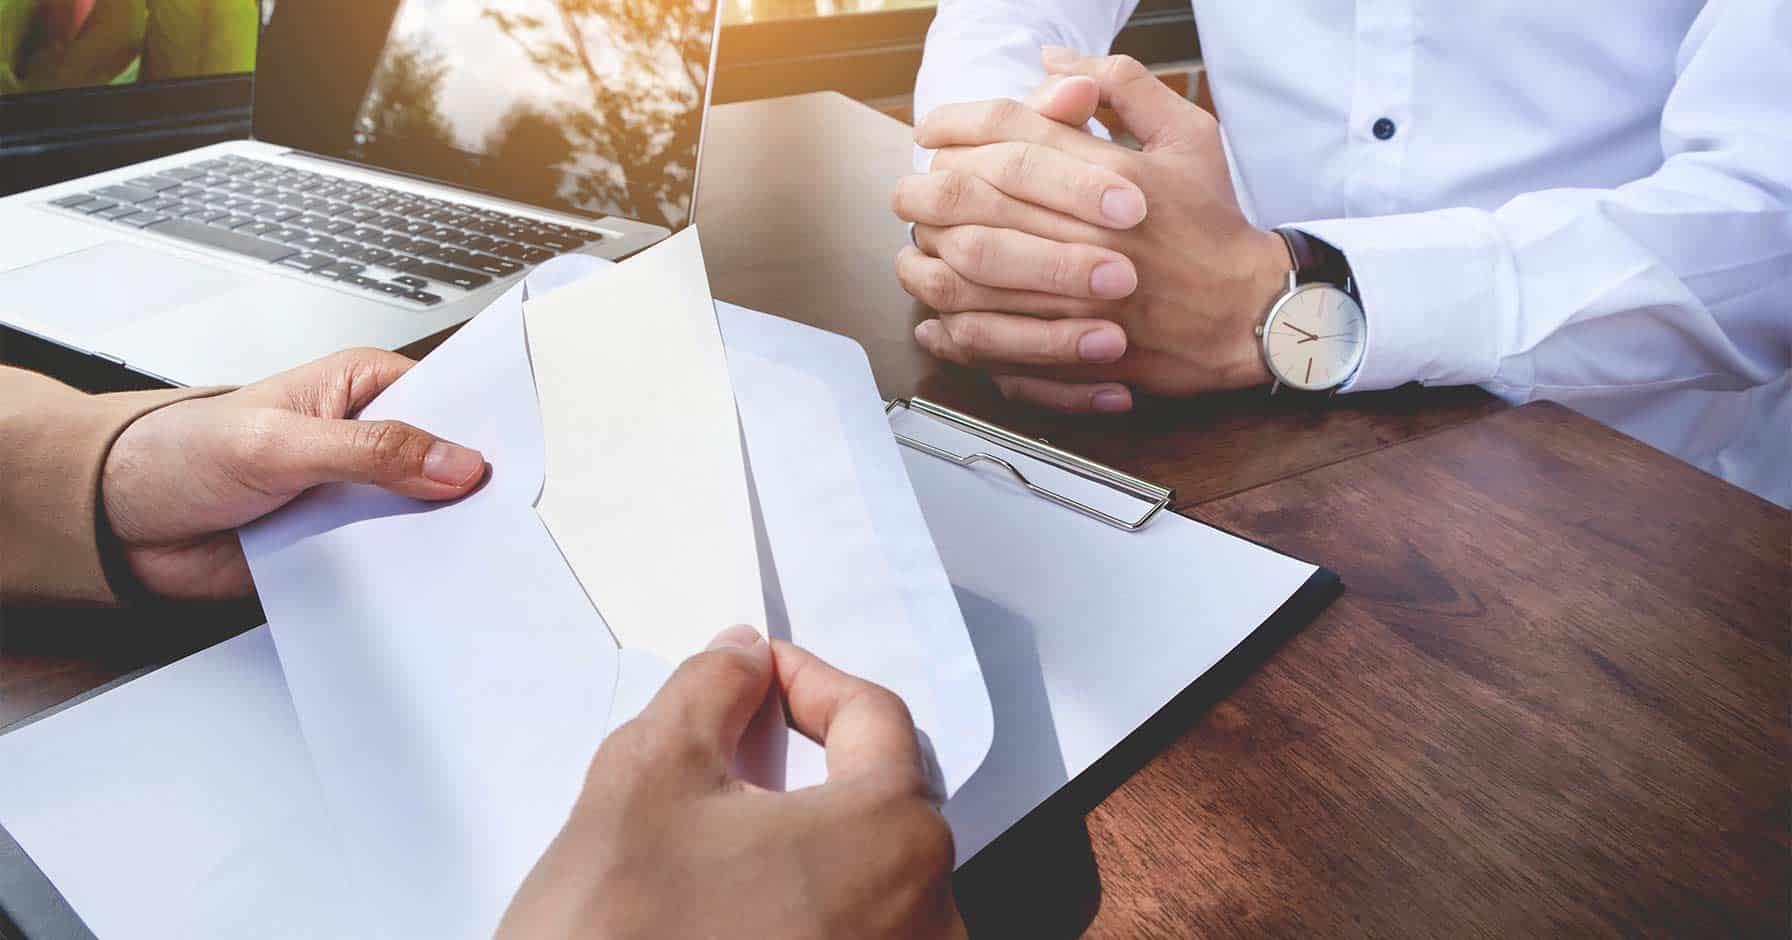 Mietvertrag Kündigen Rechtssicheres Muster Jetzt Kostenlos